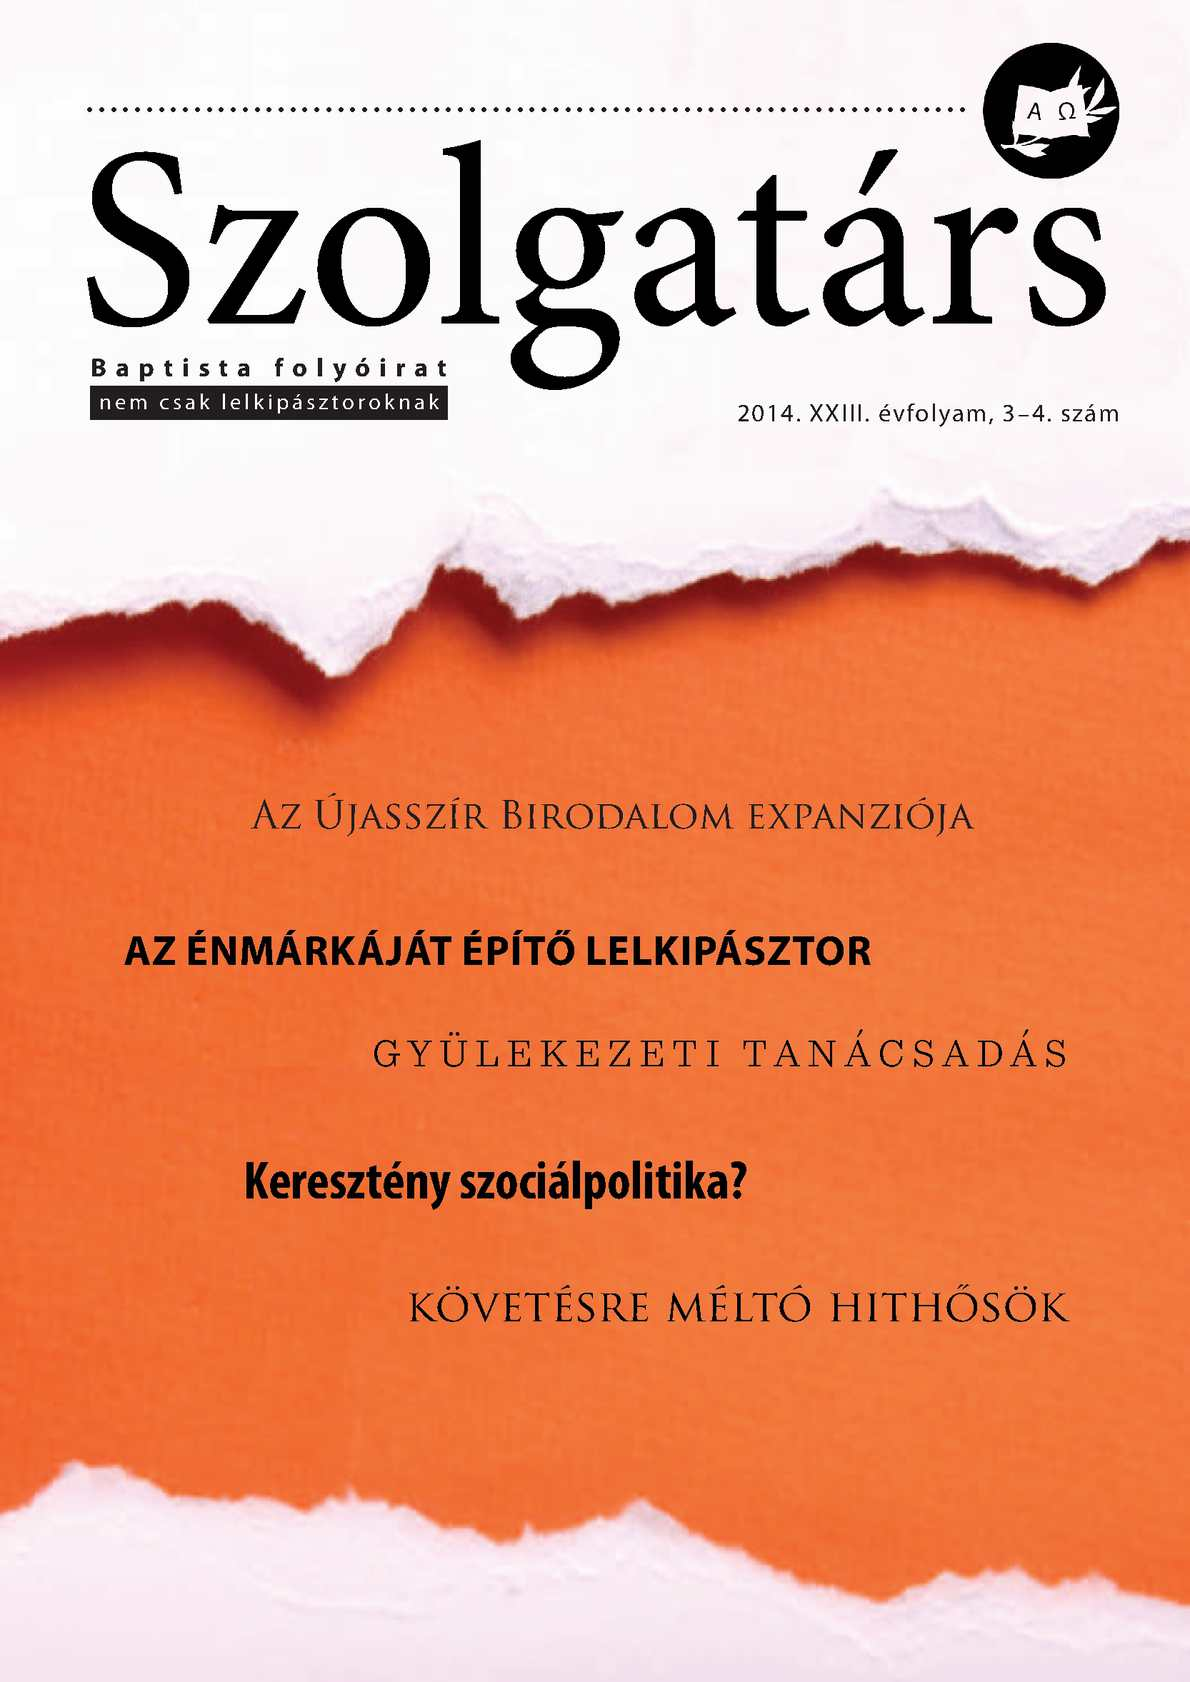 aszcariasis tabletták ascariasisból széklet giardiasis